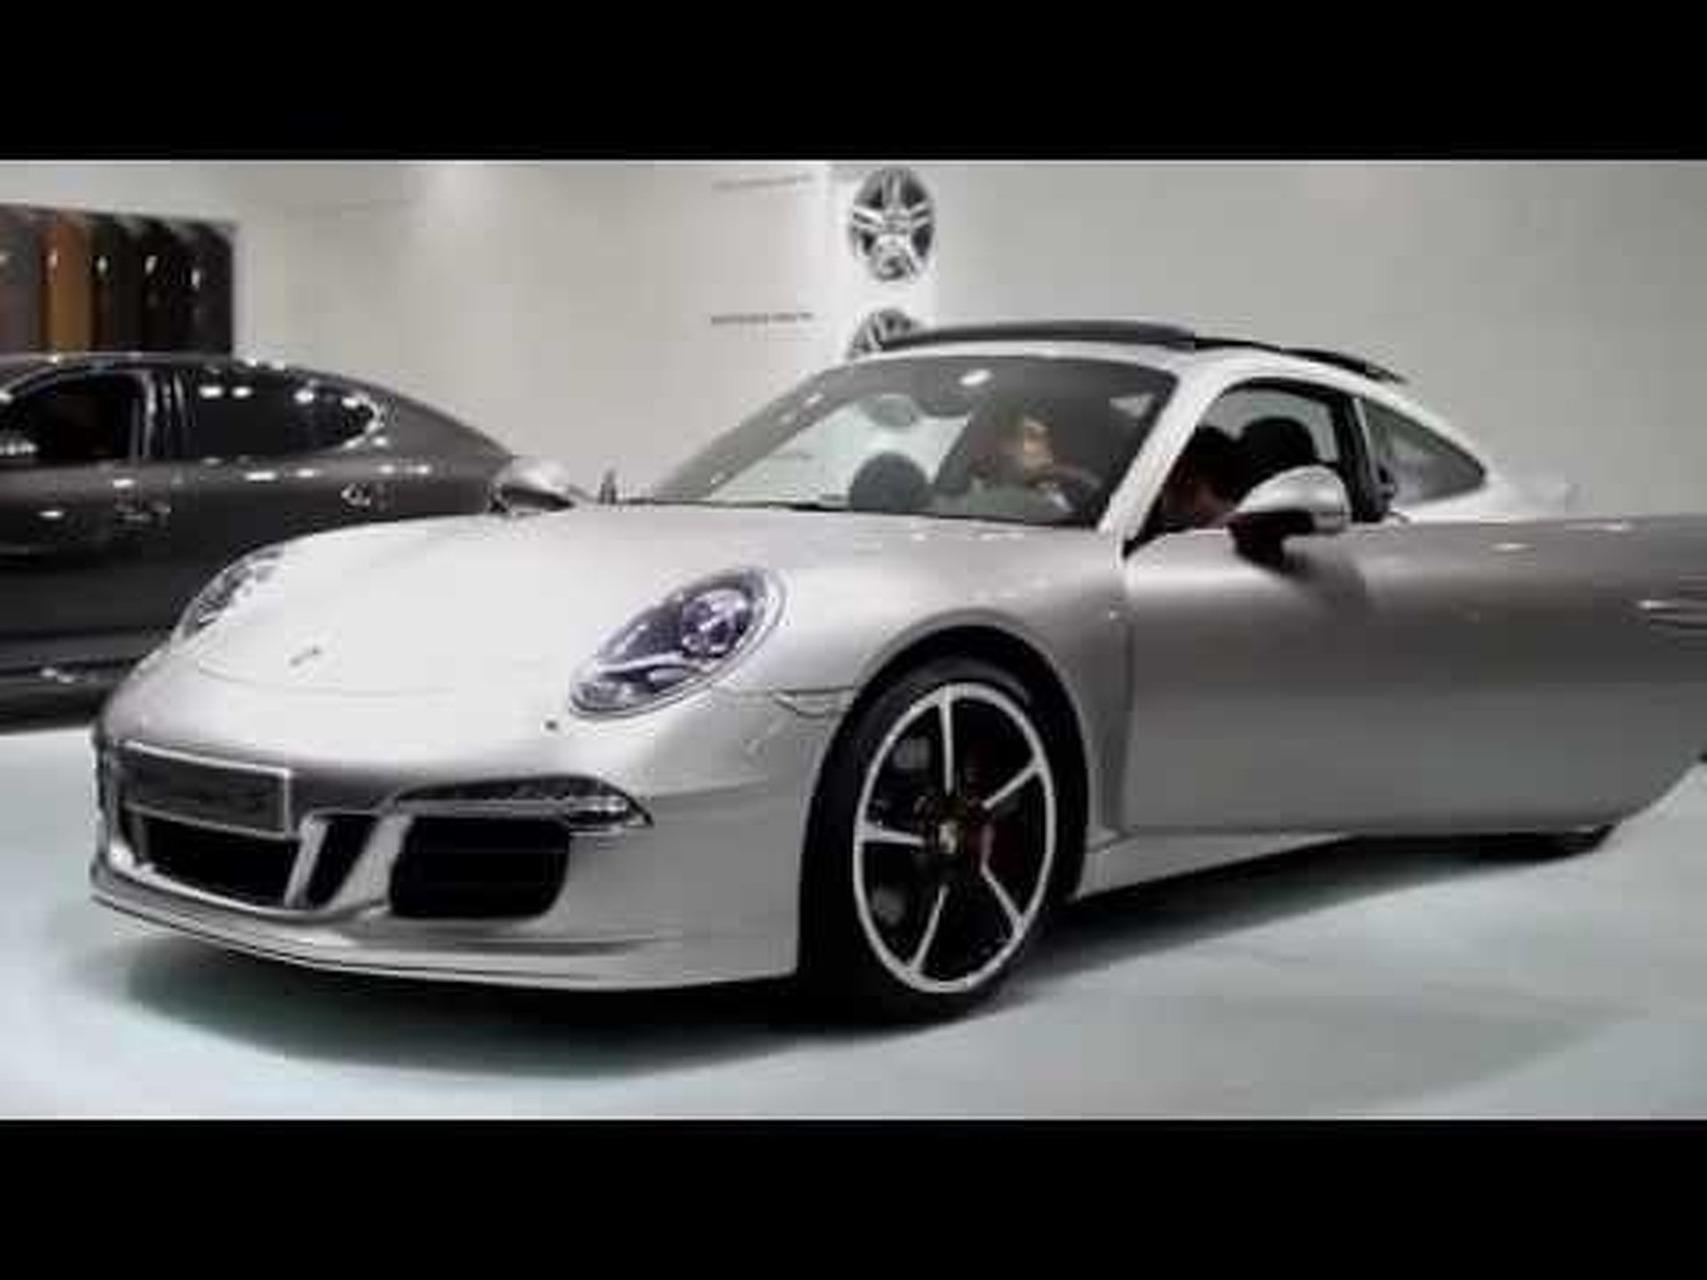 2012 Porsche 911 Carrera Interior - 2011 Frankfurt Motor Show Video